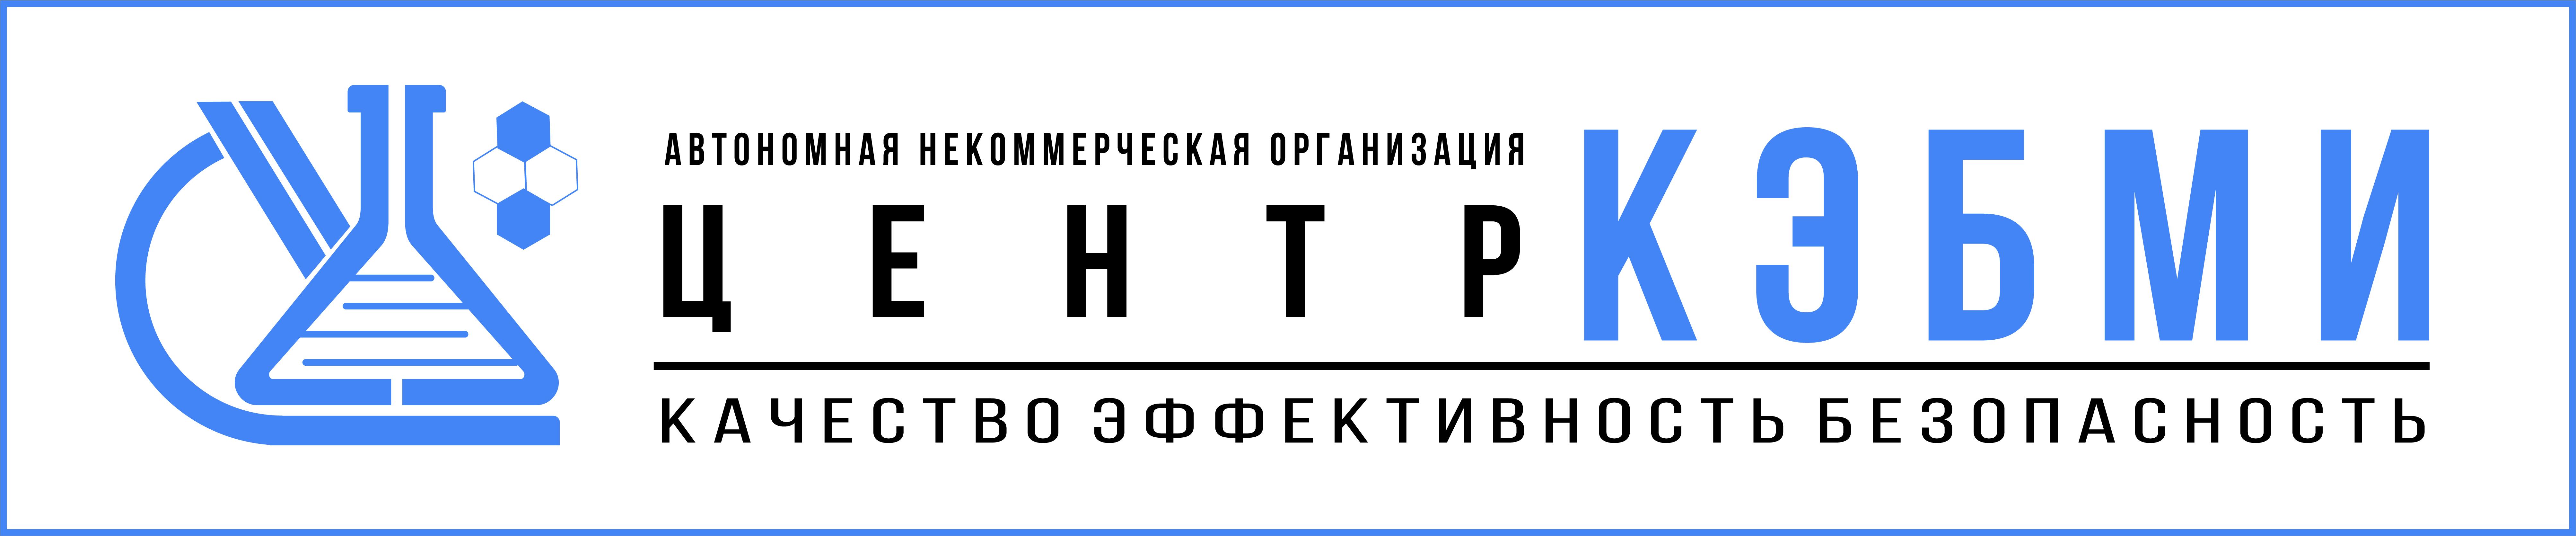 Редизайн логотипа АНО Центр КЭБМИ - BREVIS фото f_7915b27b395125a2.jpg